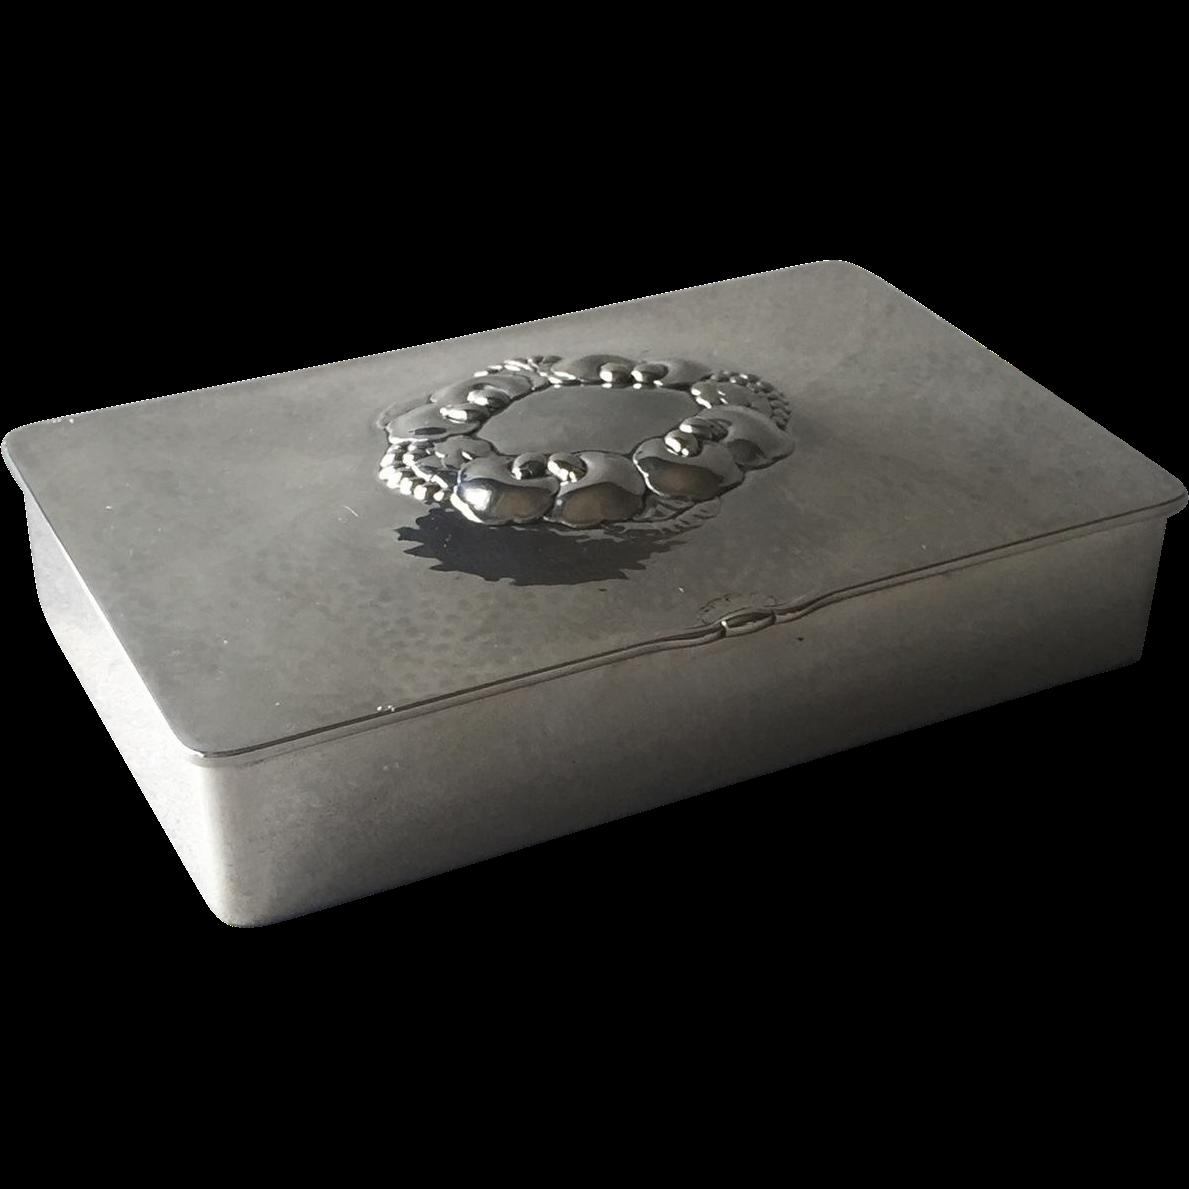 georg jensen sterling silver keepsake box no 507a by gundorph gallery 925 ruby lane. Black Bedroom Furniture Sets. Home Design Ideas